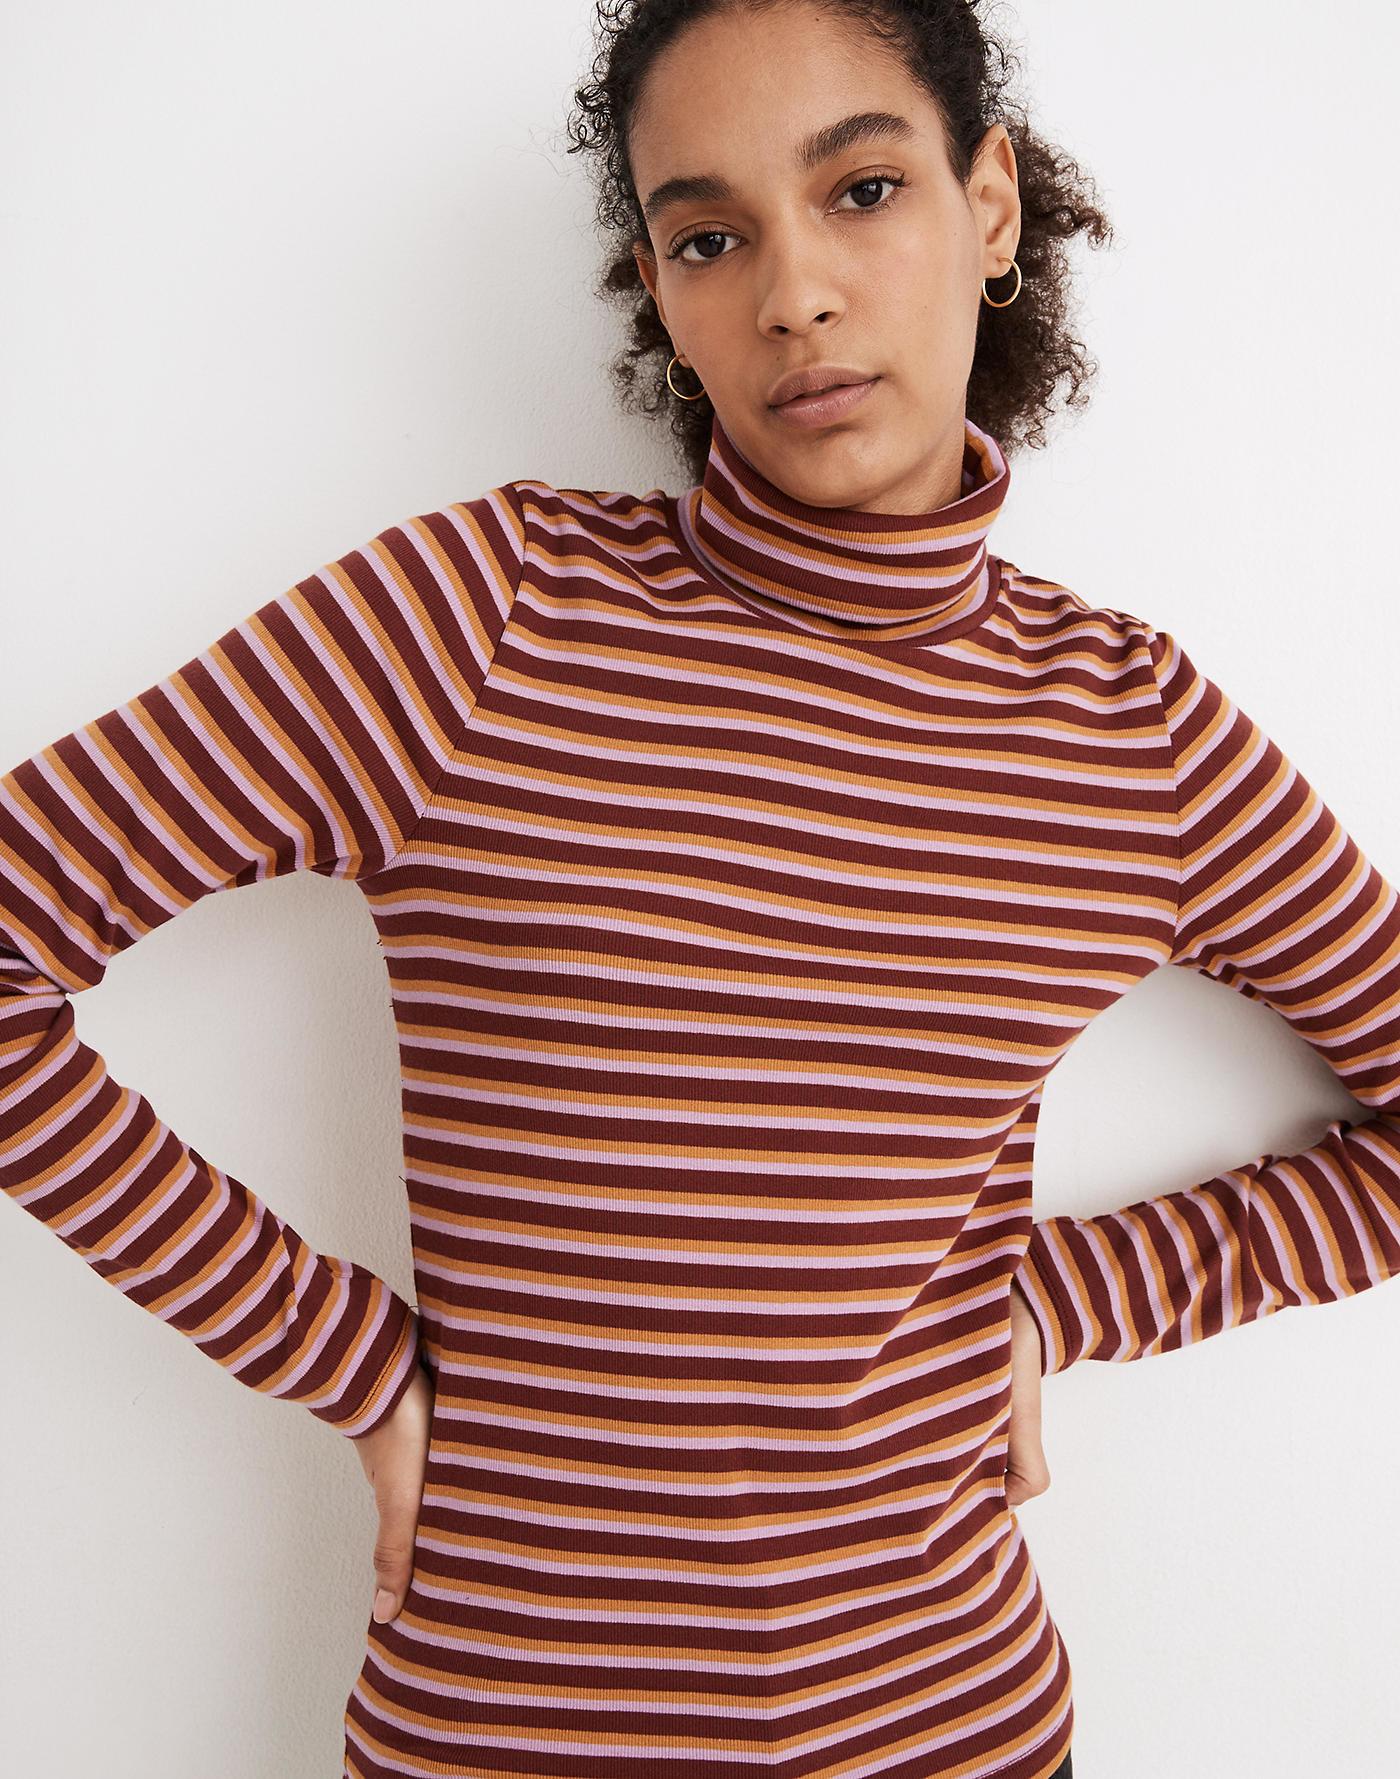 Model wearing ribbed pink turtleneck